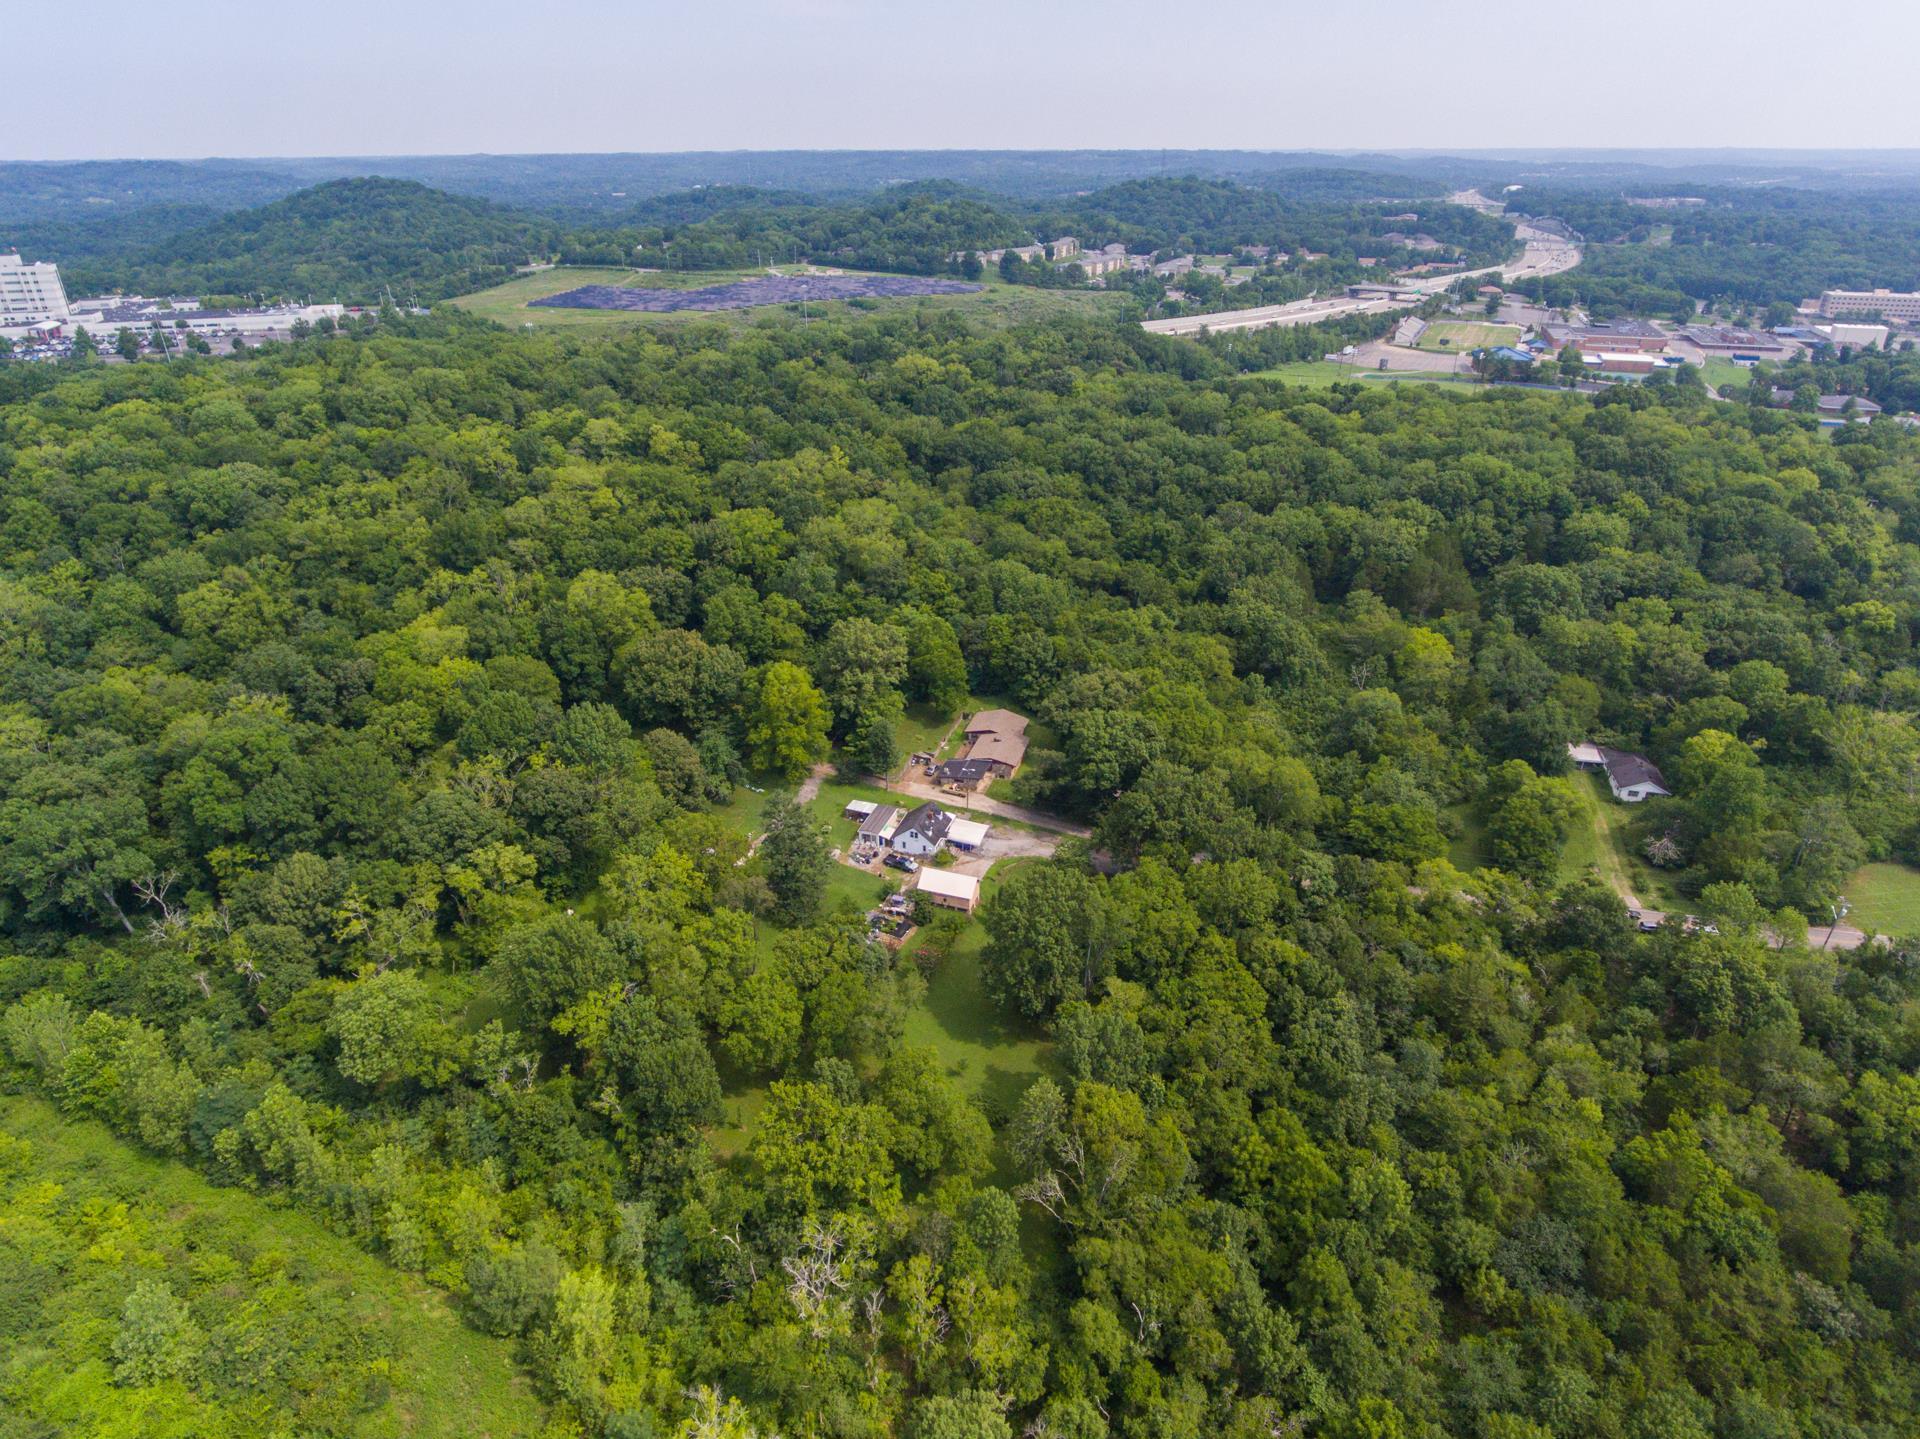 620 Cheron Rd (Creative Way), Madison, TN 37115 - Madison, TN real estate listing